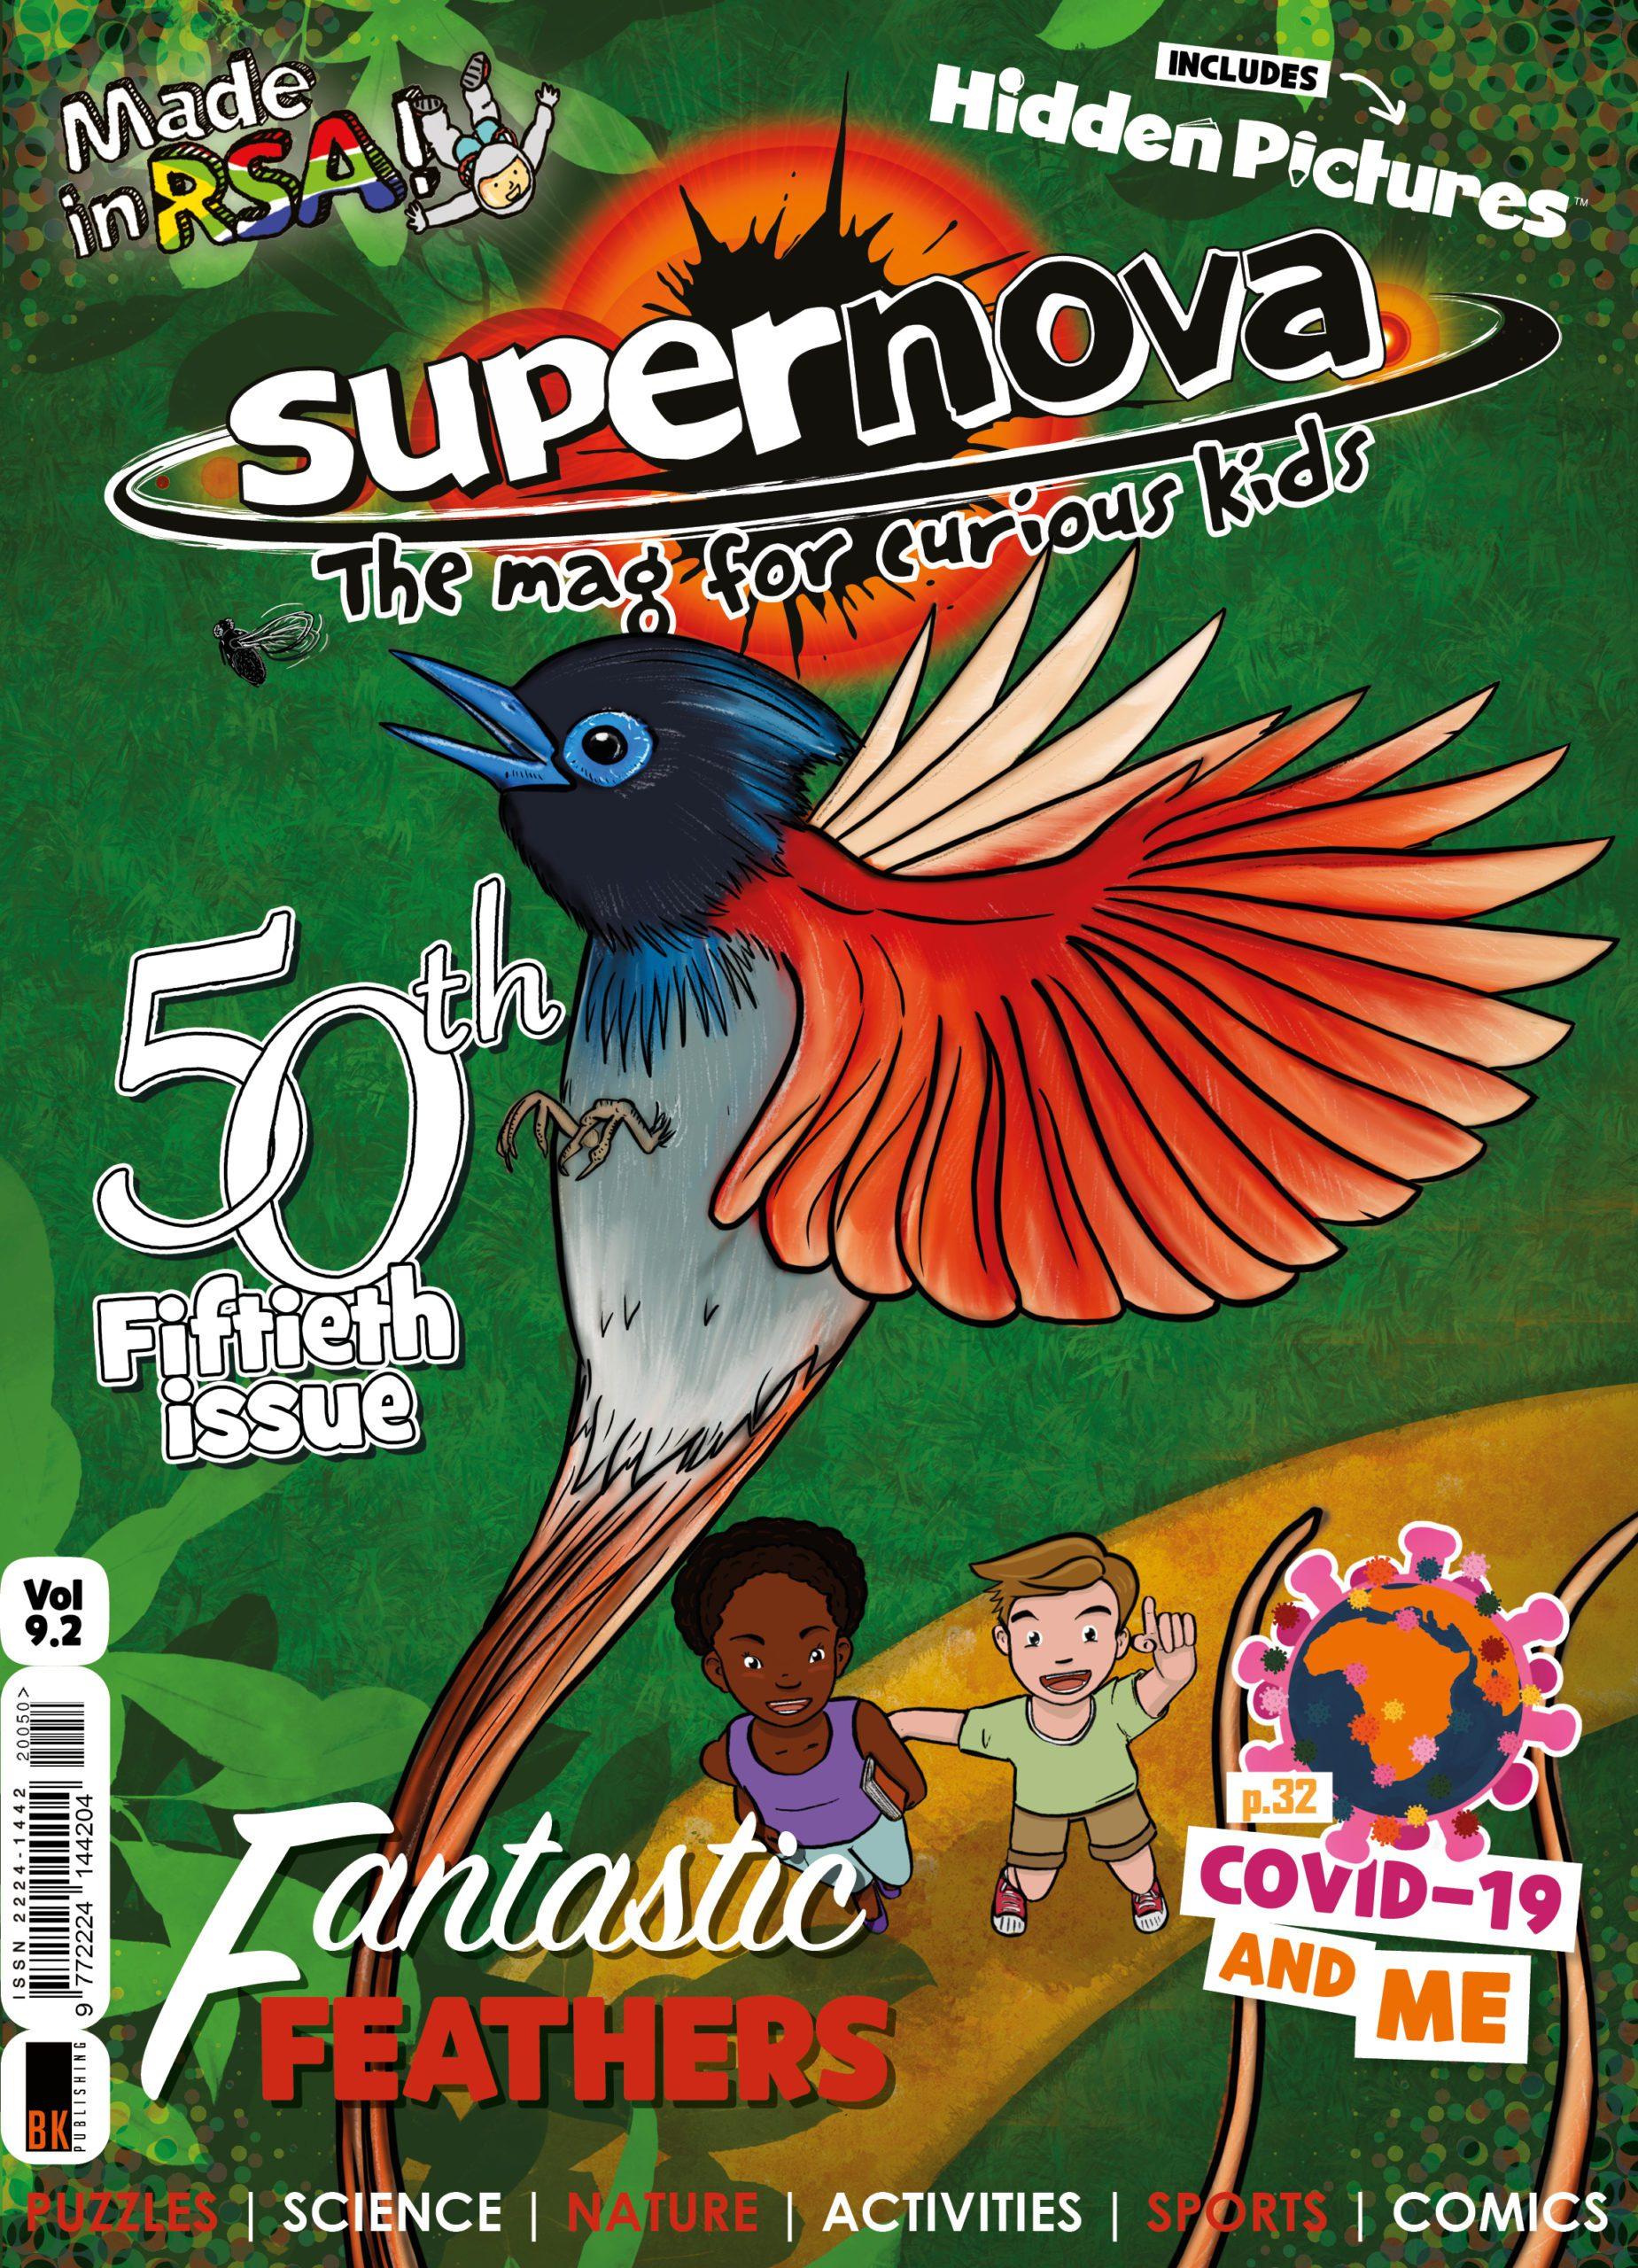 Supernova Vol 9.2 - 50th Issue